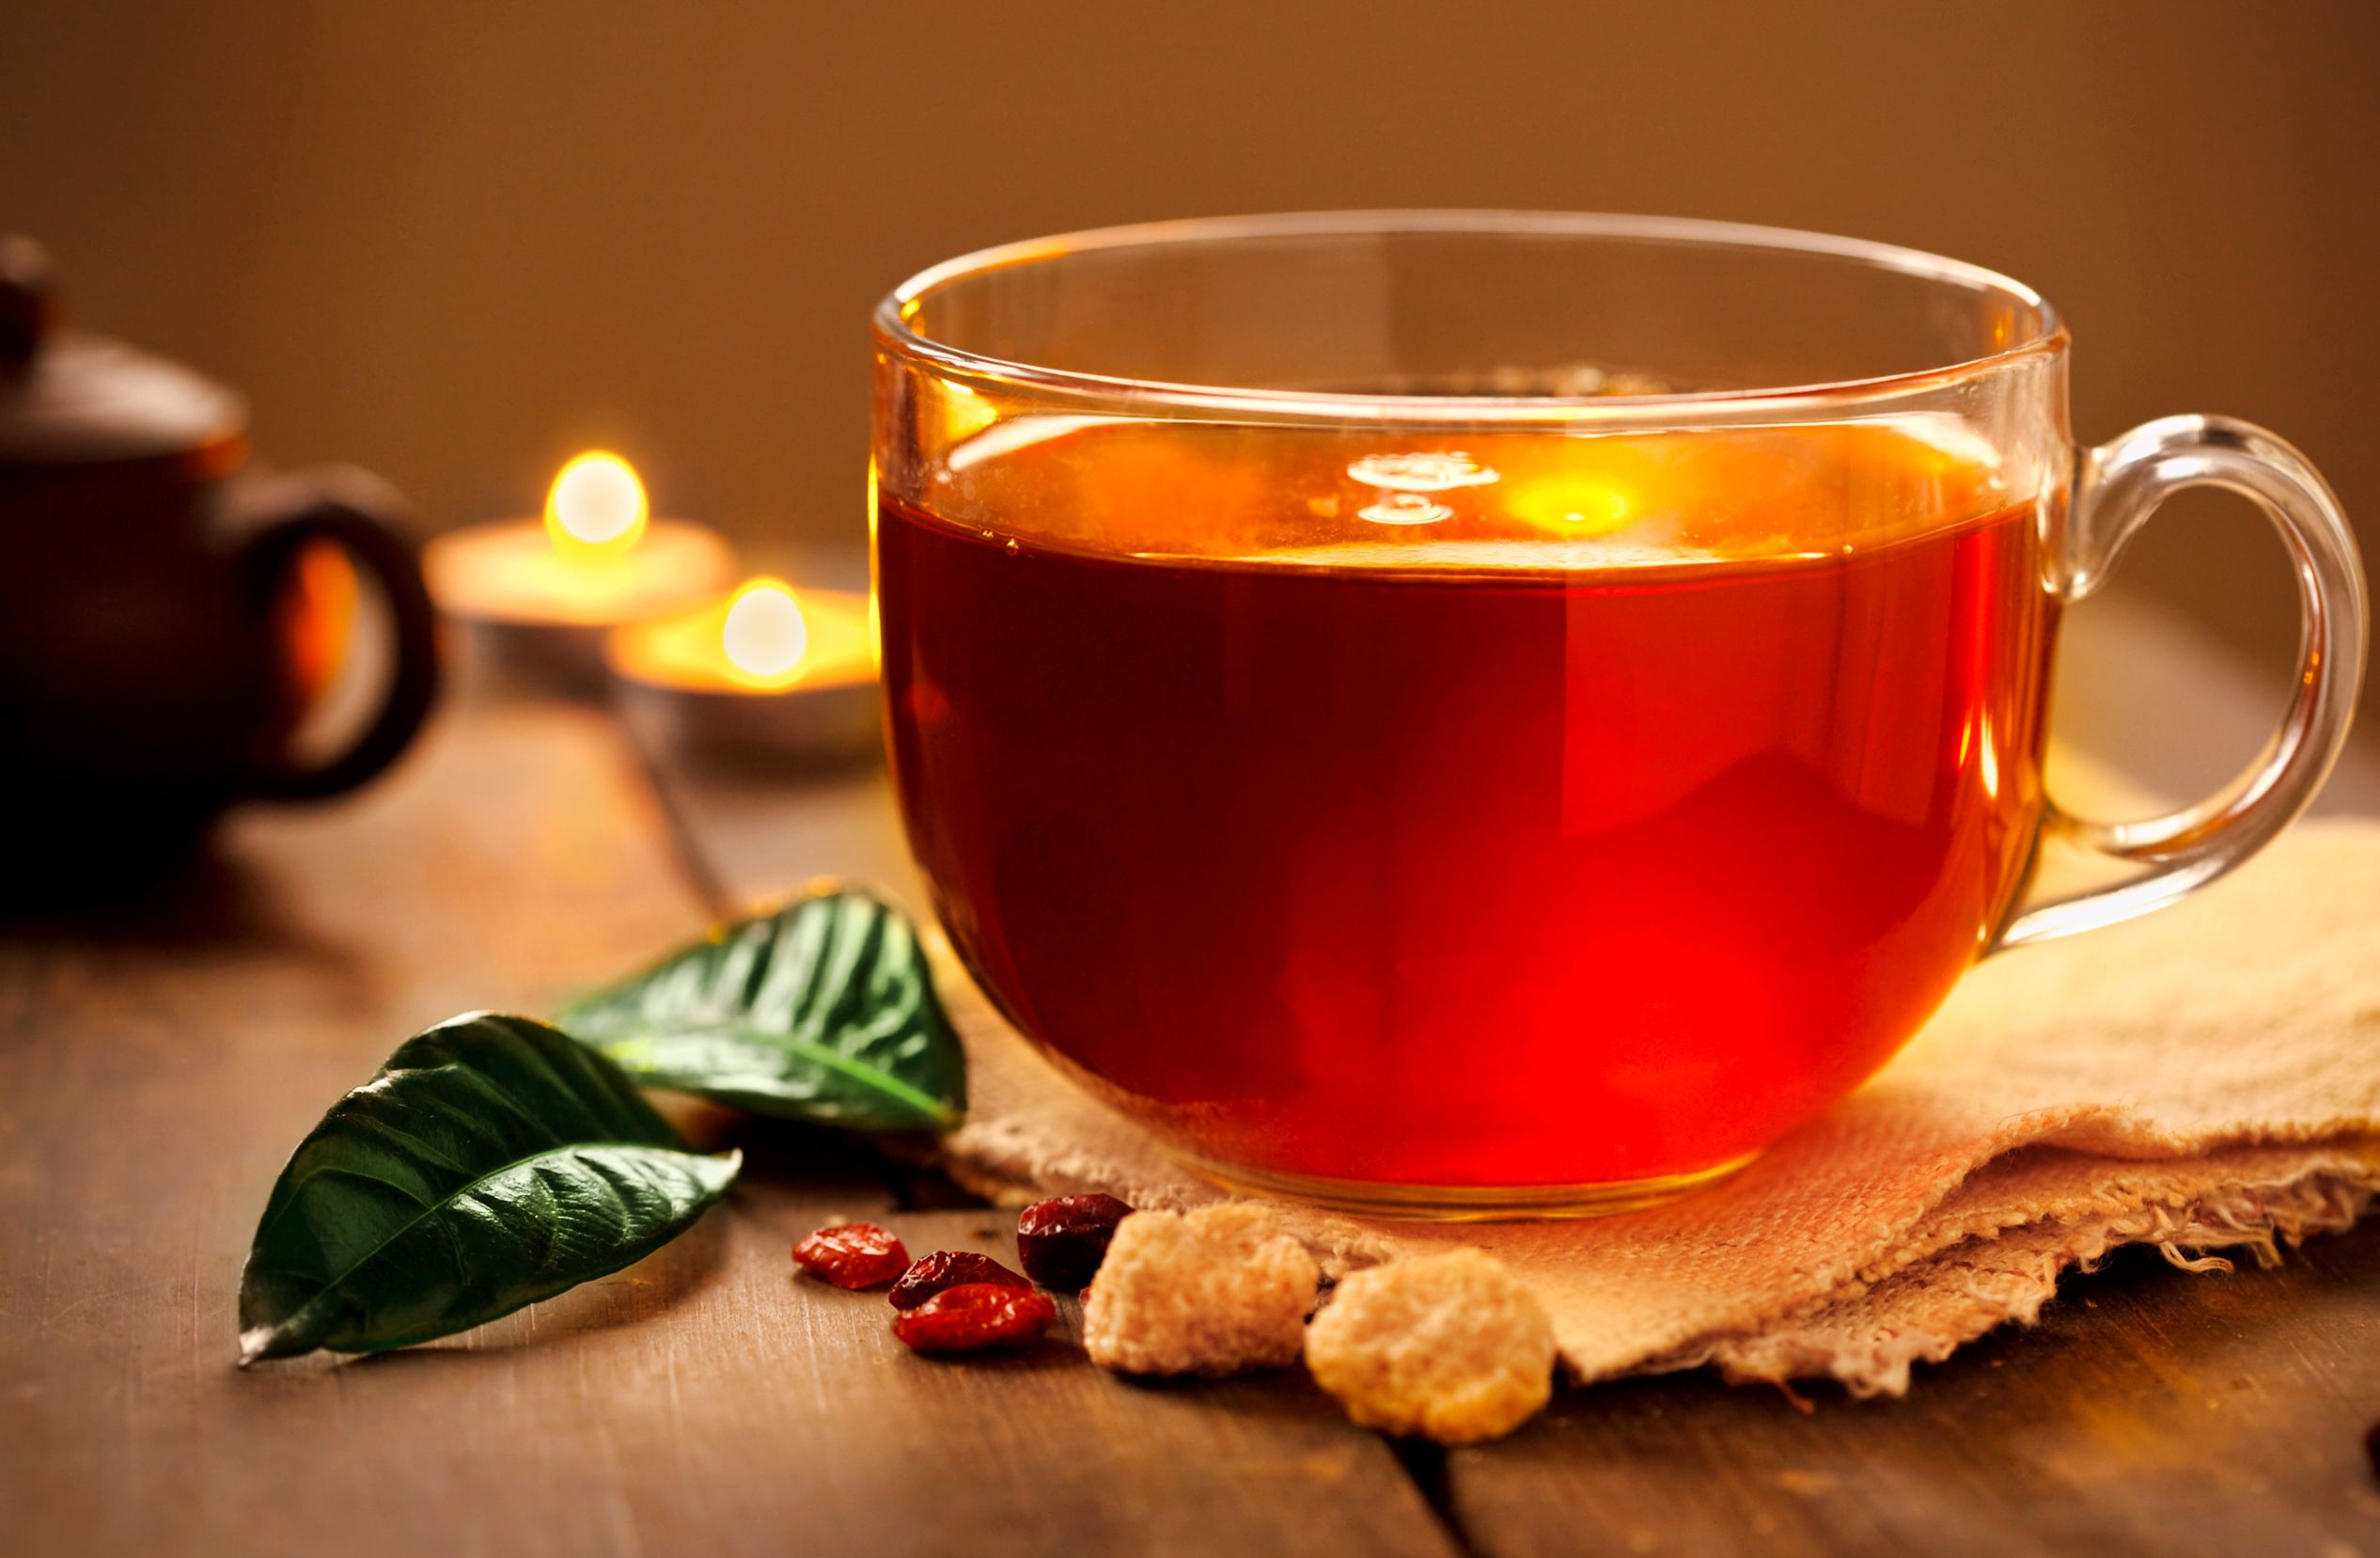 The vision of World Tea Coffee Expo Mumbai India